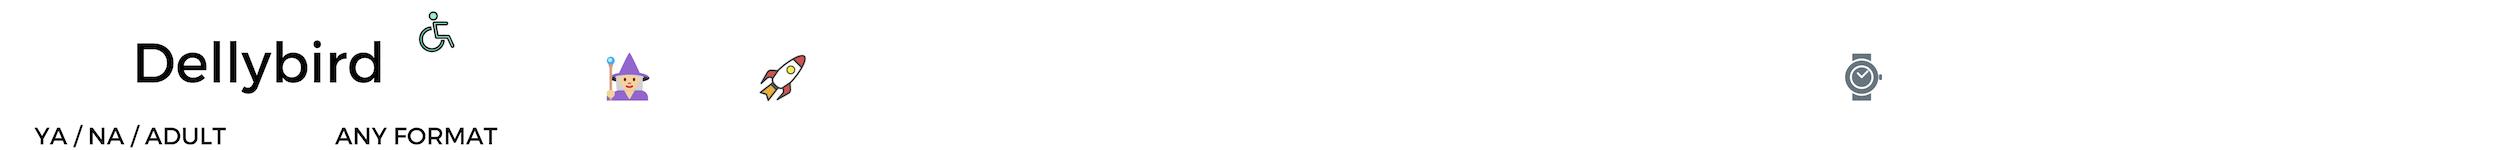 BOOK BLOG COMMUNITY _ BANNER + PROFILES [2500 x 150] (2).jpg